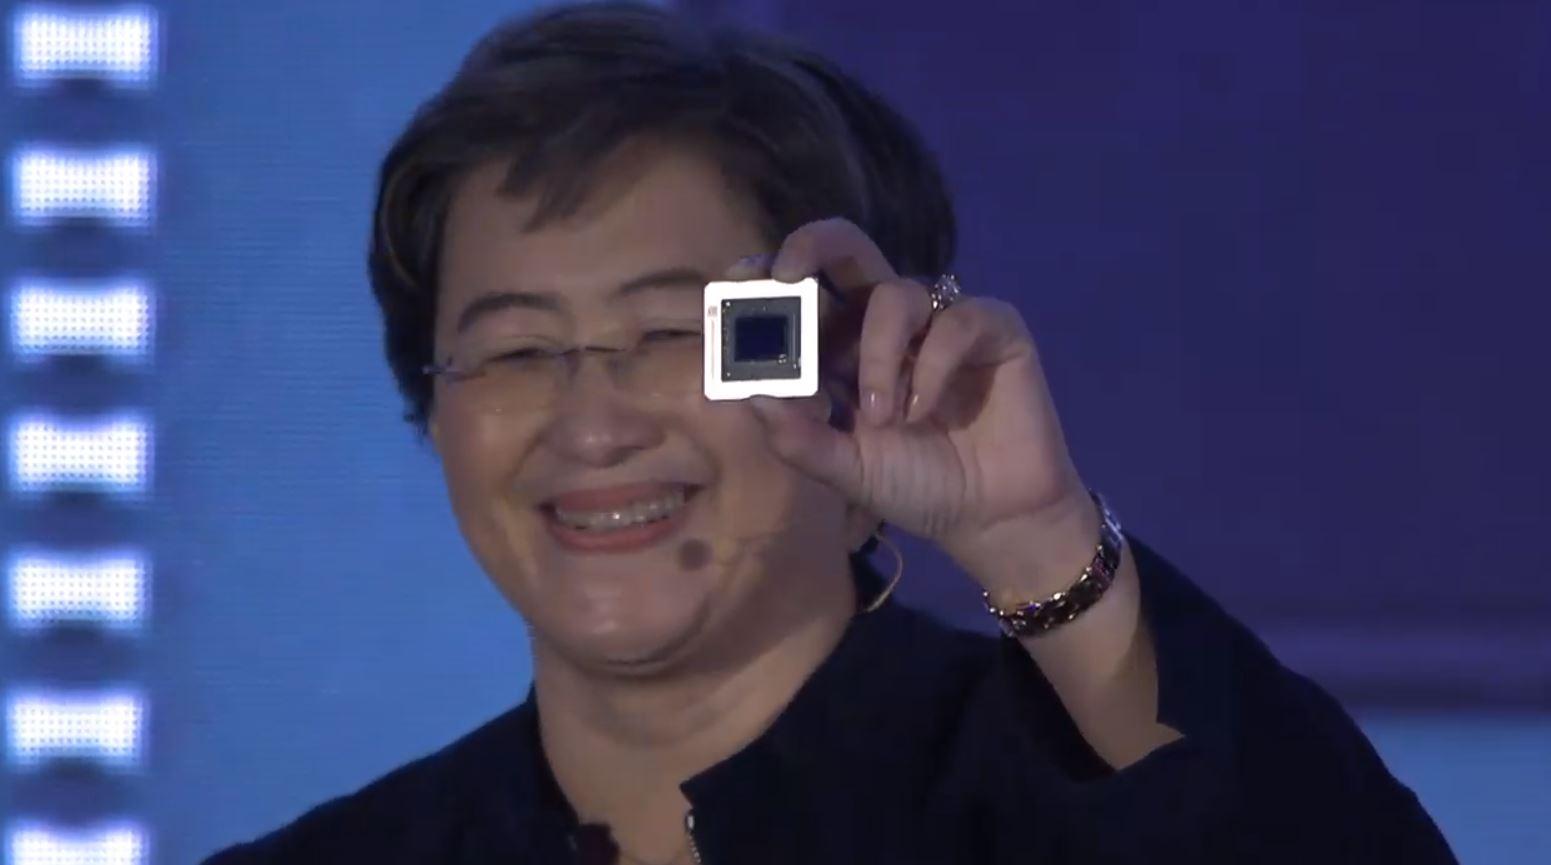 AMD Radeon RX 5000 GPU Shot